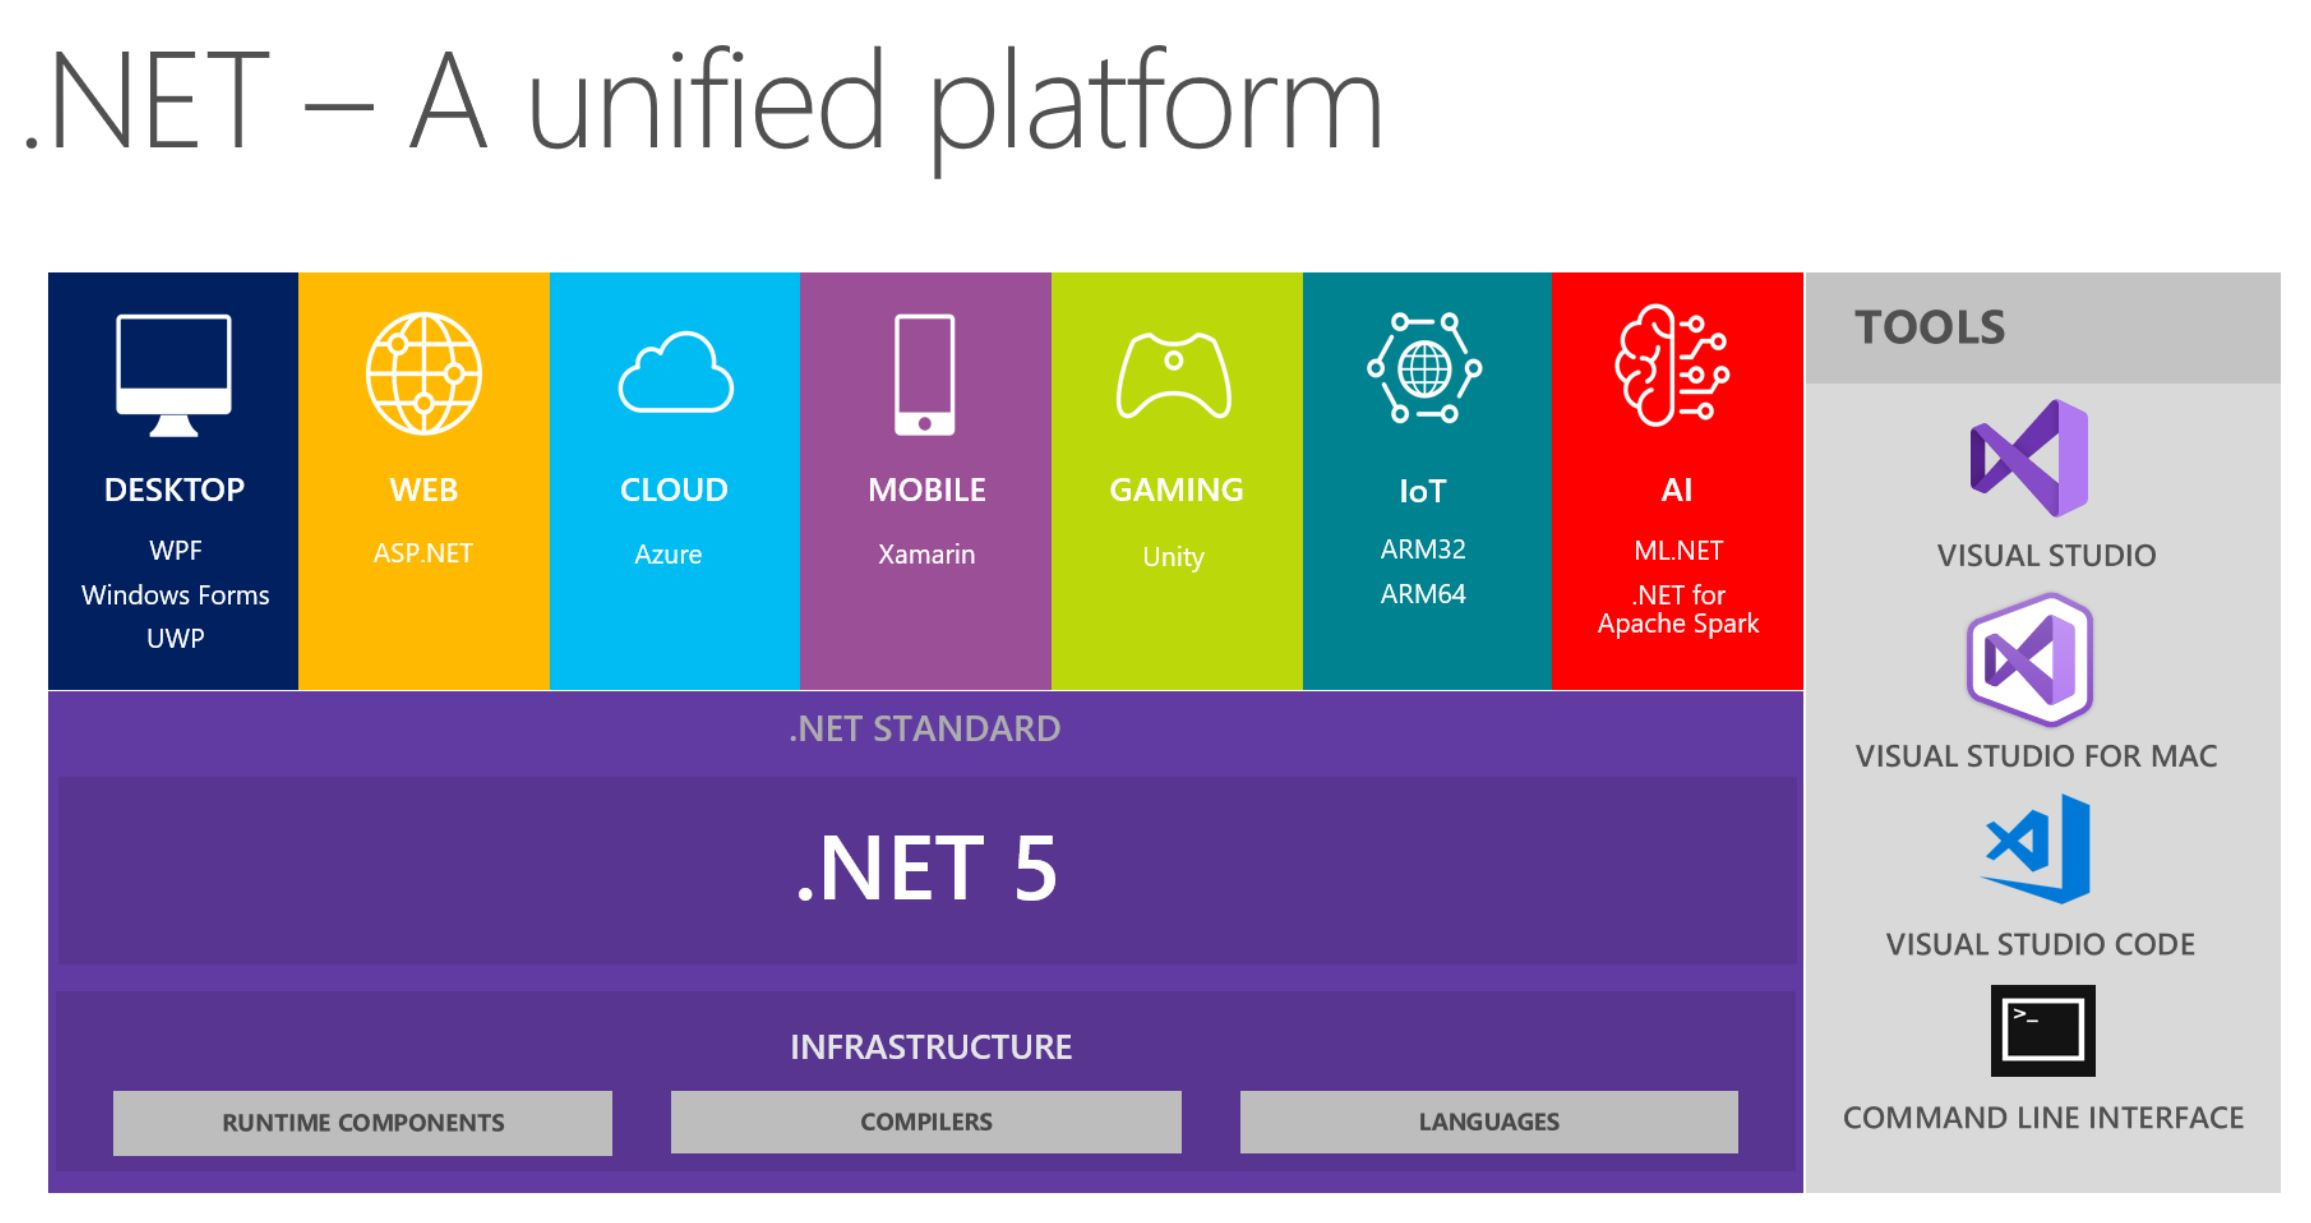 Build 2019 Roundup: Windows Terminal, Microsoft Edge and more! 11